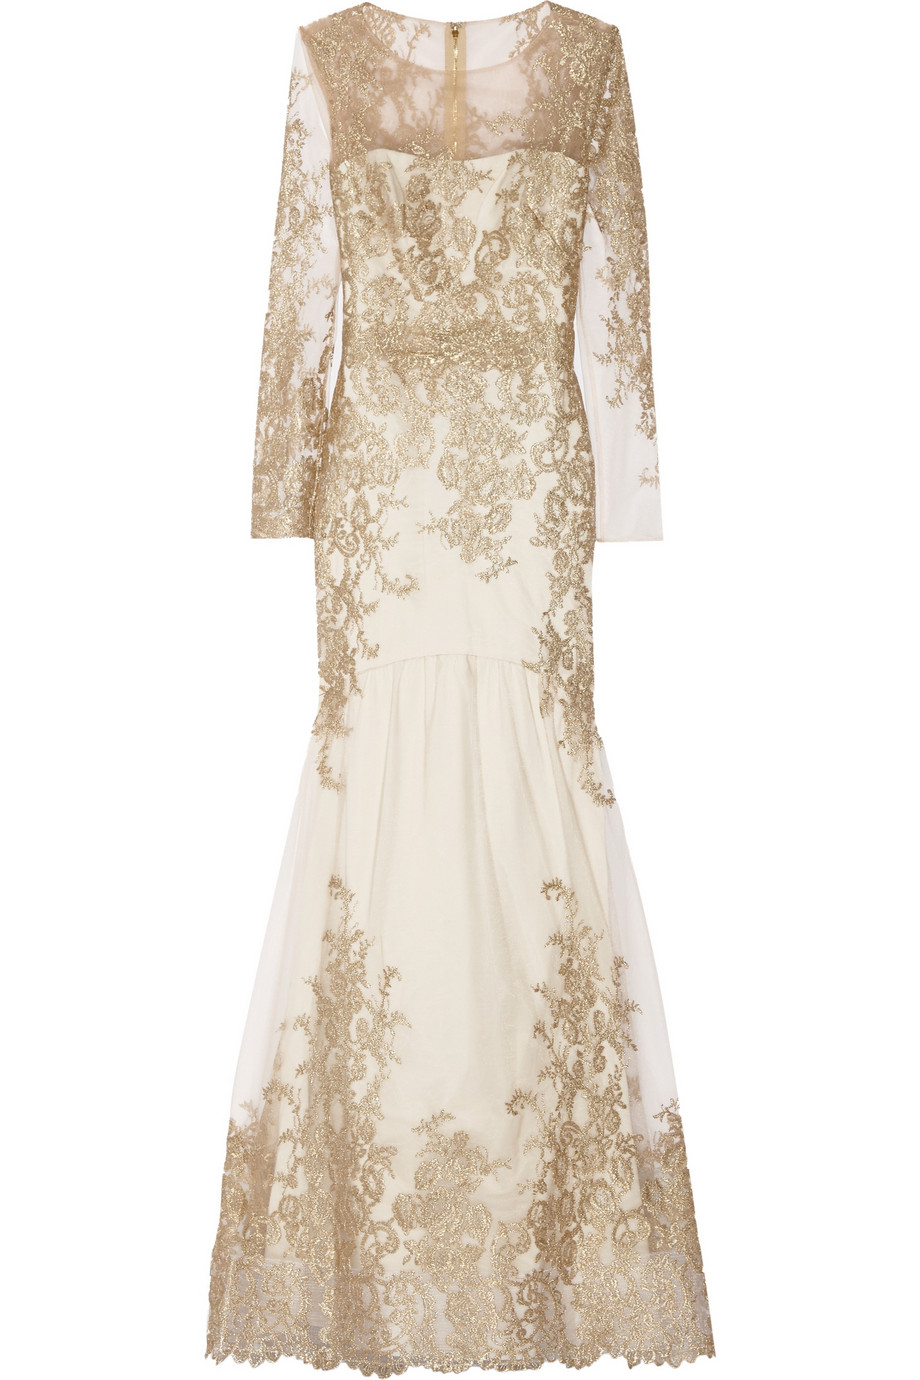 Gold Marchesa Wedding Dress